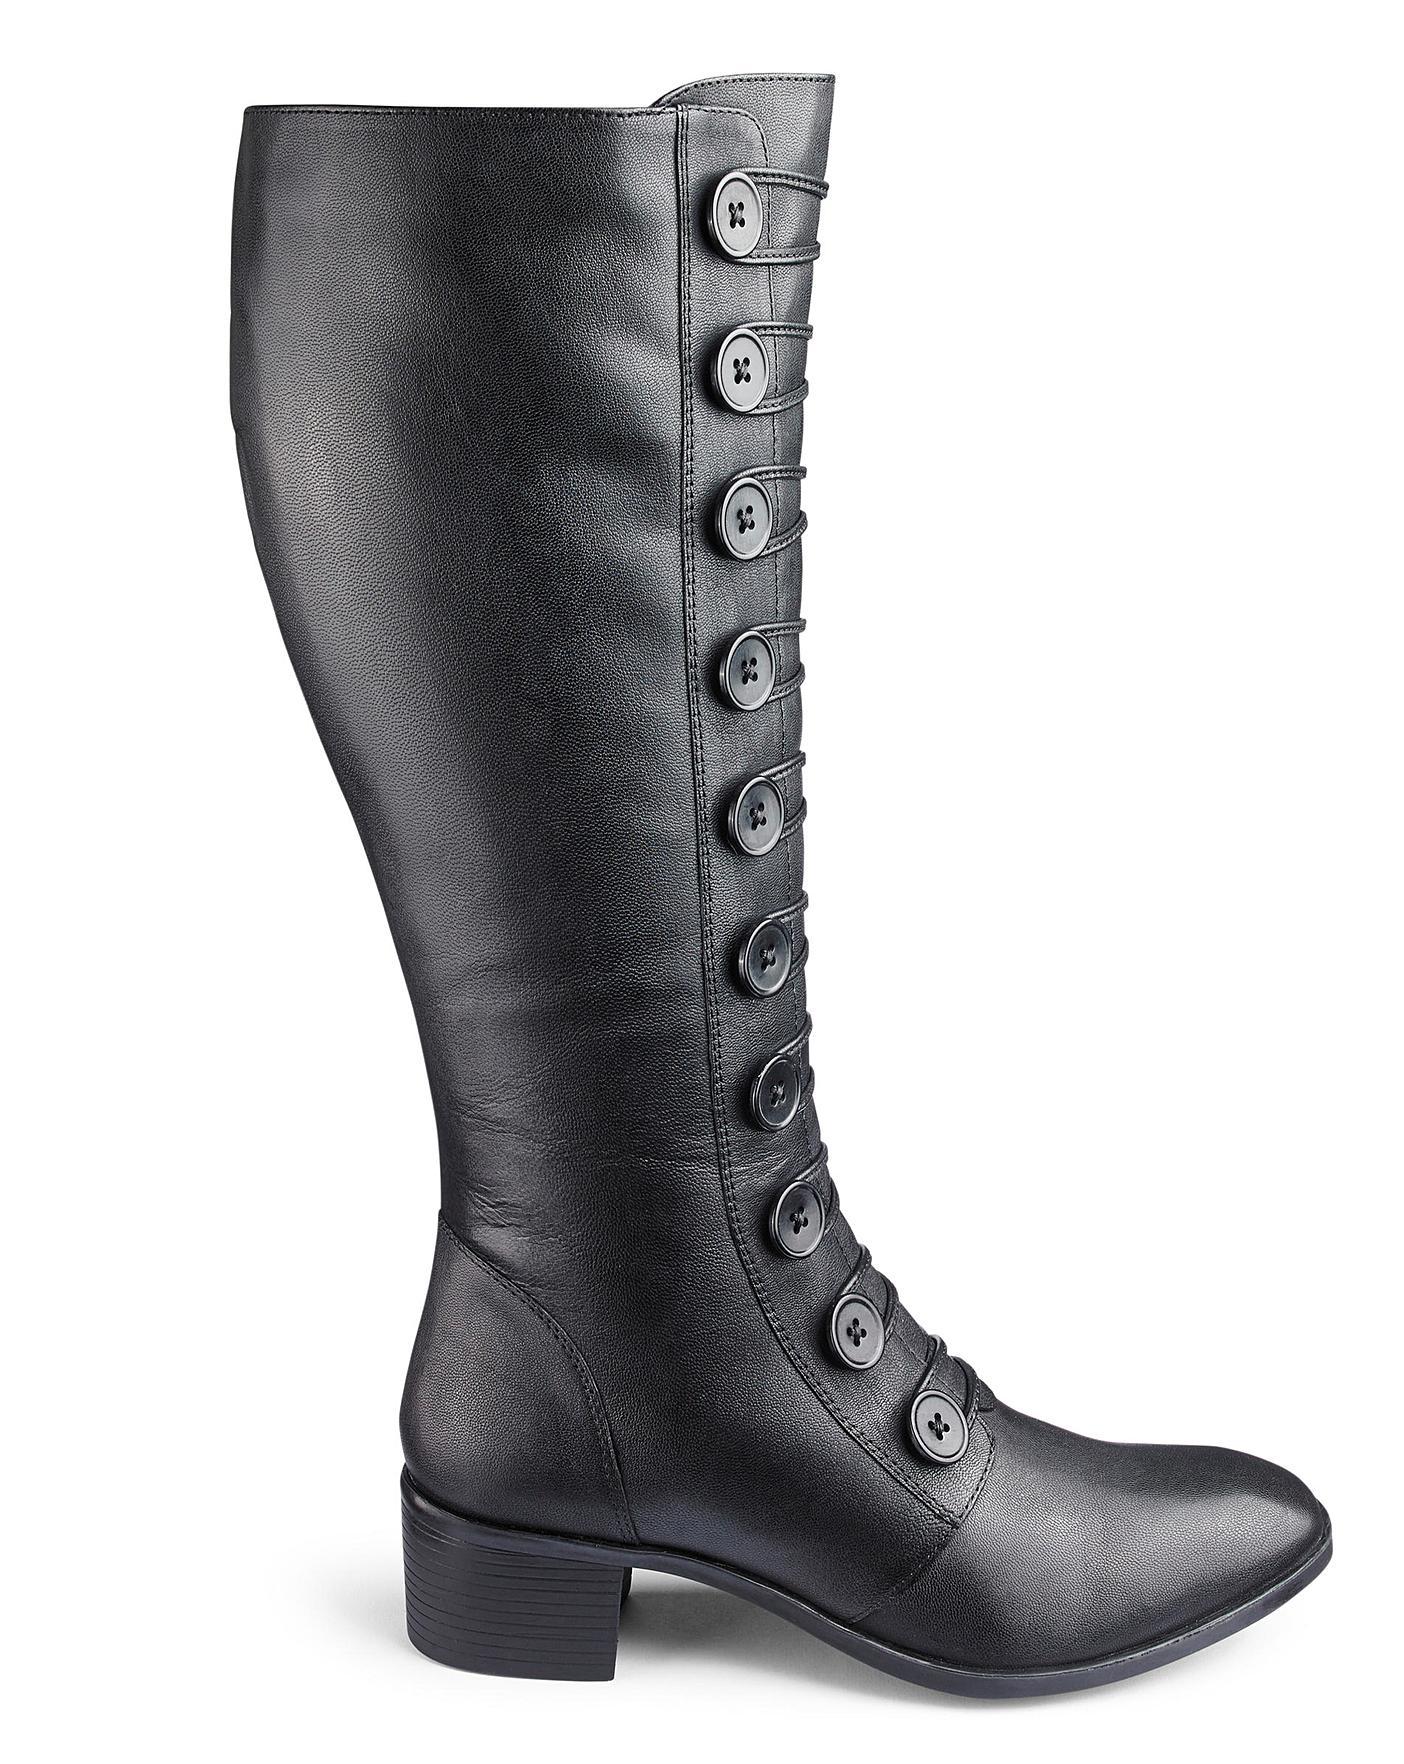 Lotus Spindle Boots EEE Curvy Plus Calf